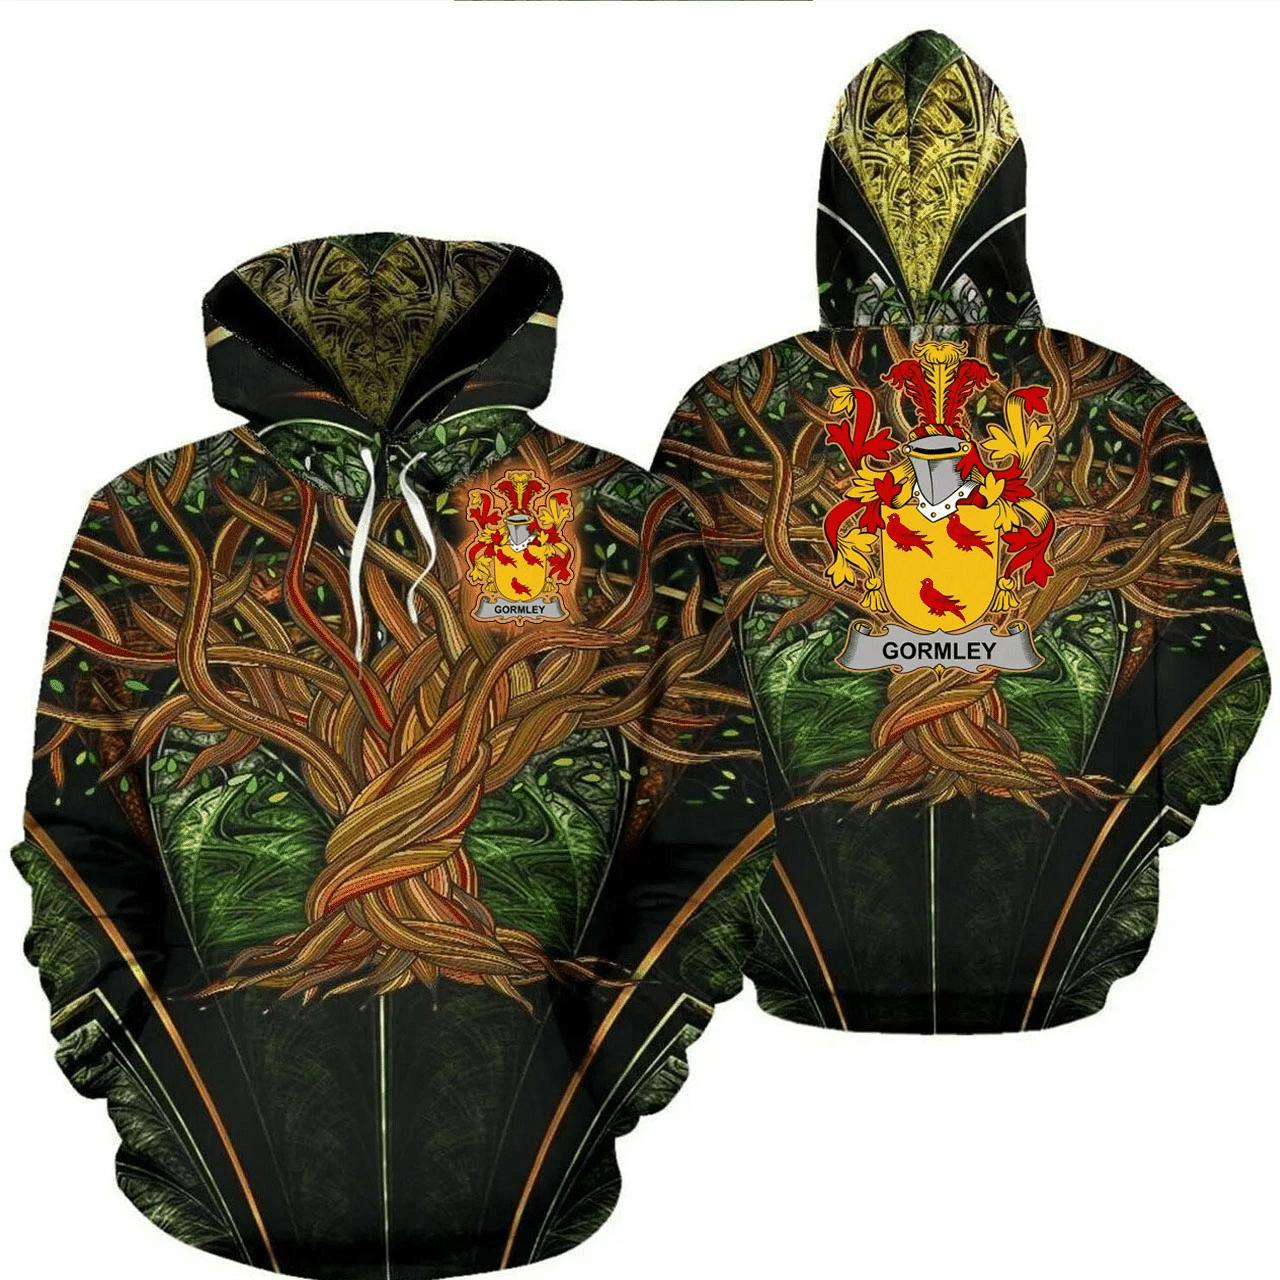 1stIreland Ireland Hoodie - Gormley or O'Gormley Irish Family Crest Hoodie - Tree Of Life A7